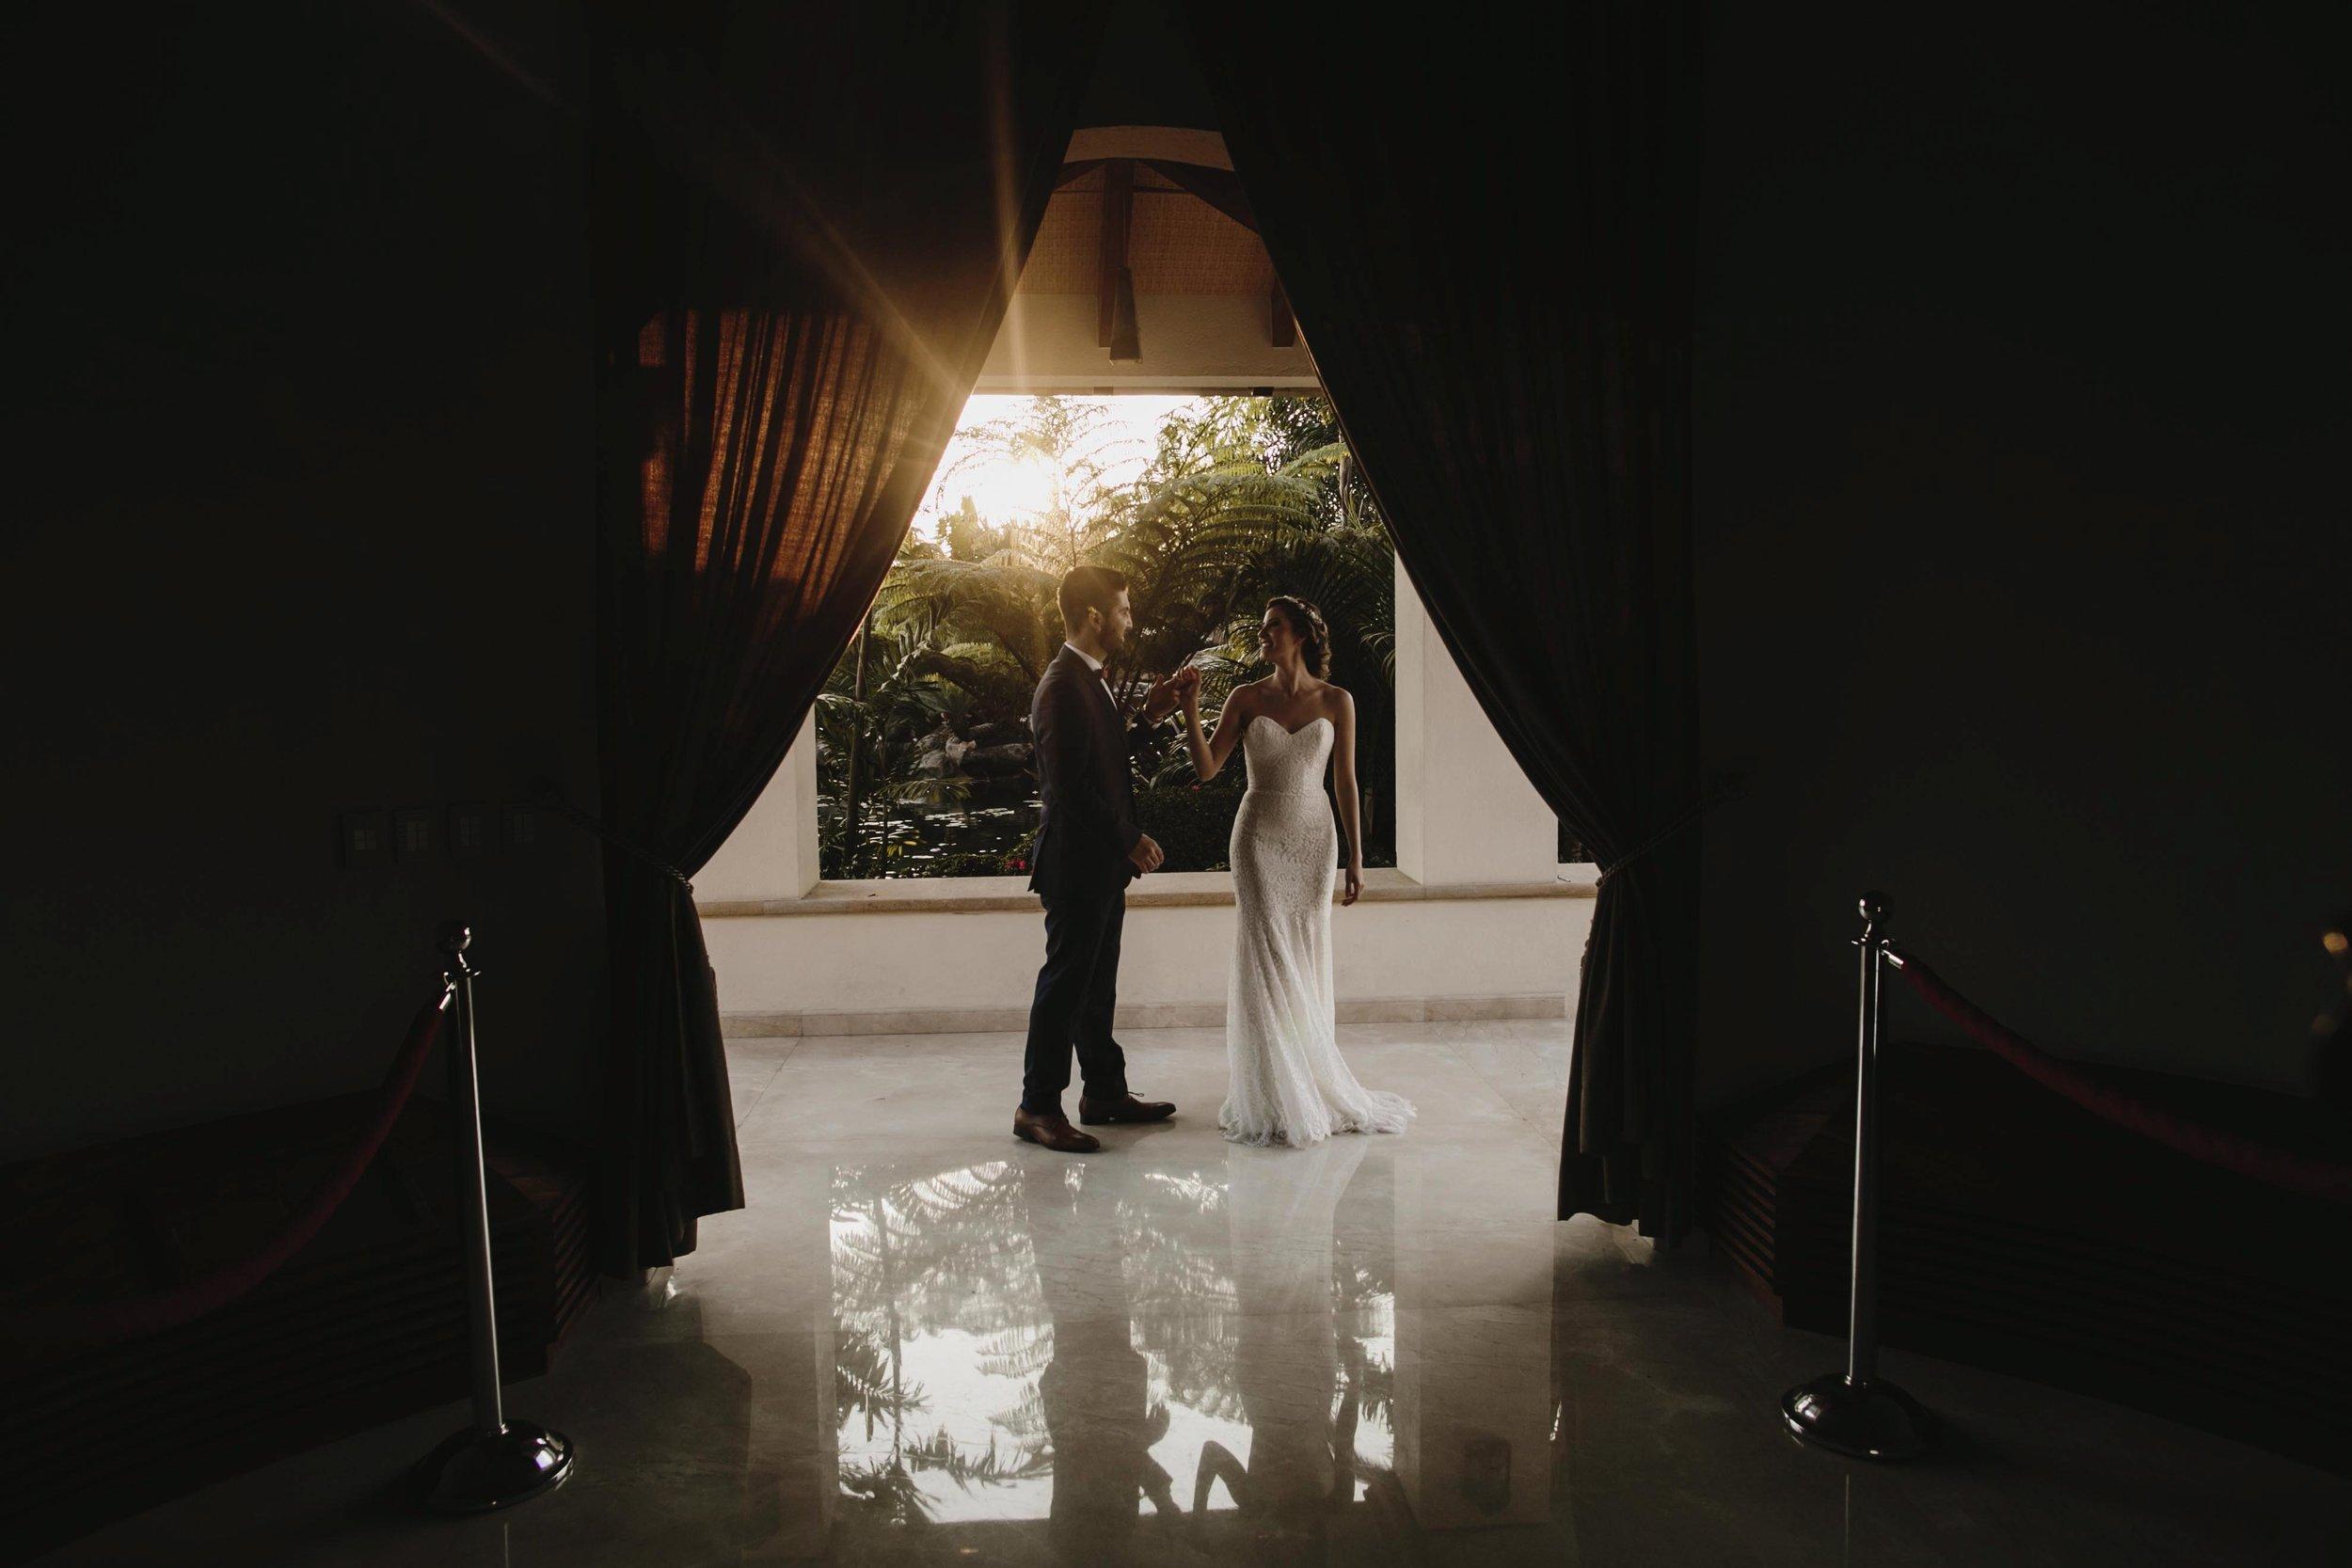 alfonso_flores_destination_wedding_photography_jardin_amarello_cuernavaca59.jpg